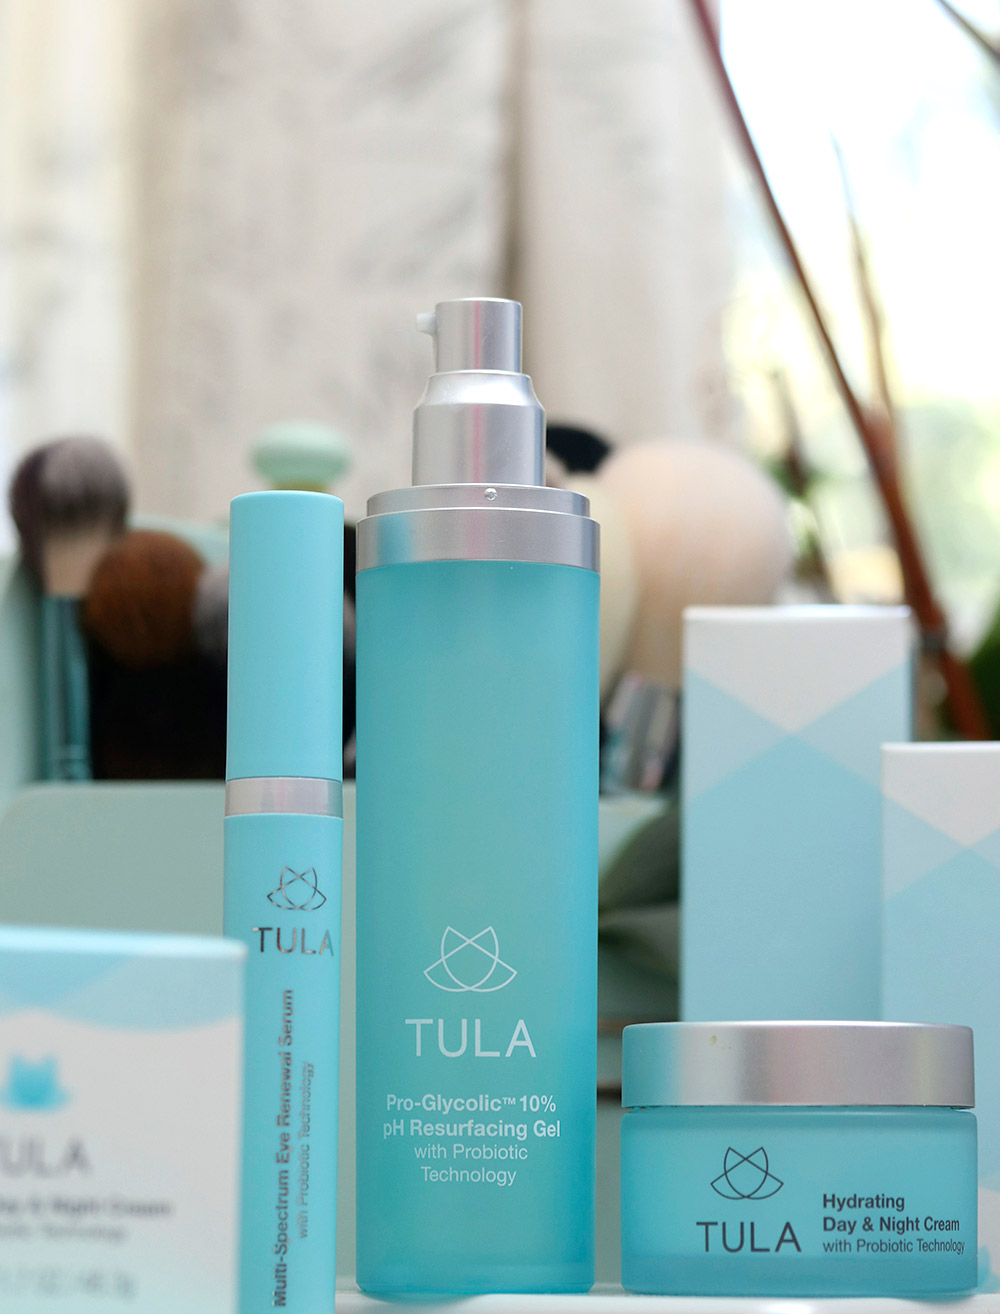 tula skincare review